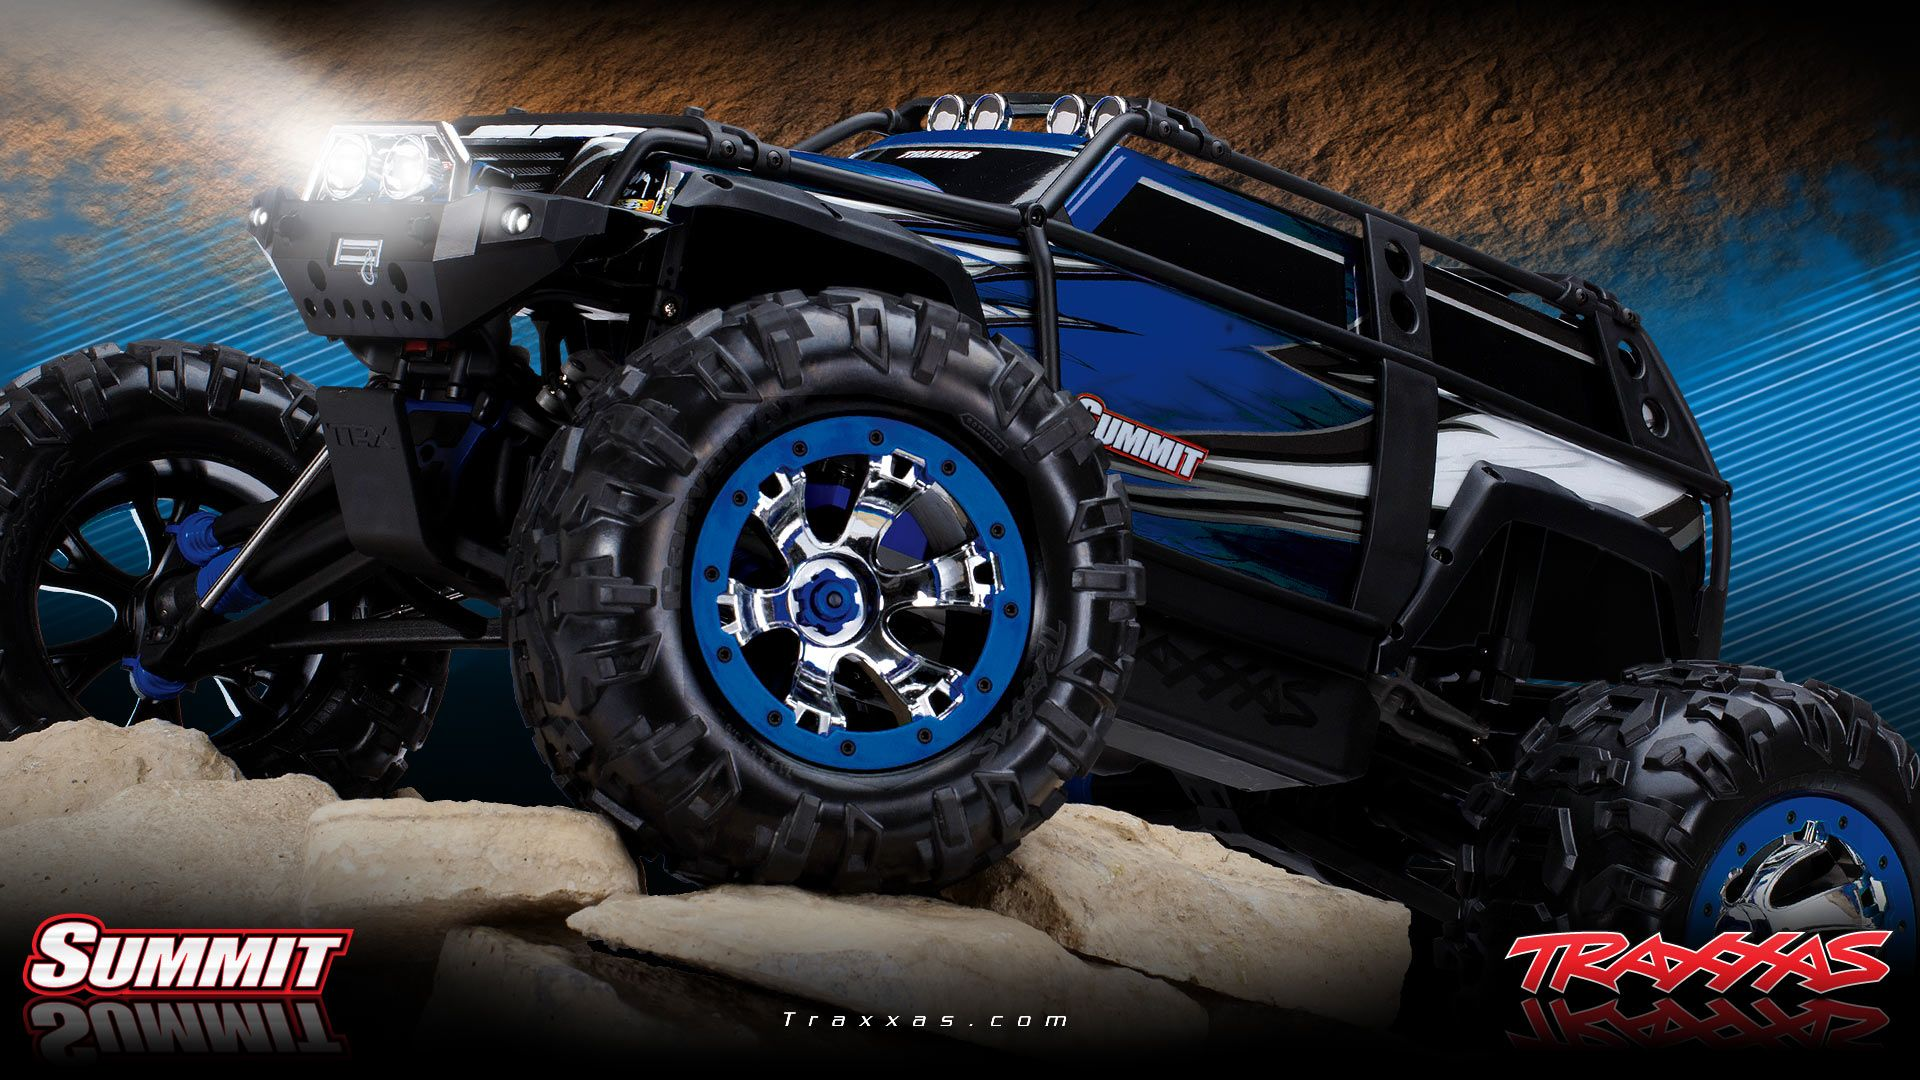 Traxxas Summit Remote Control Cars Rc Trucks Screensaver Used Slash For Sale